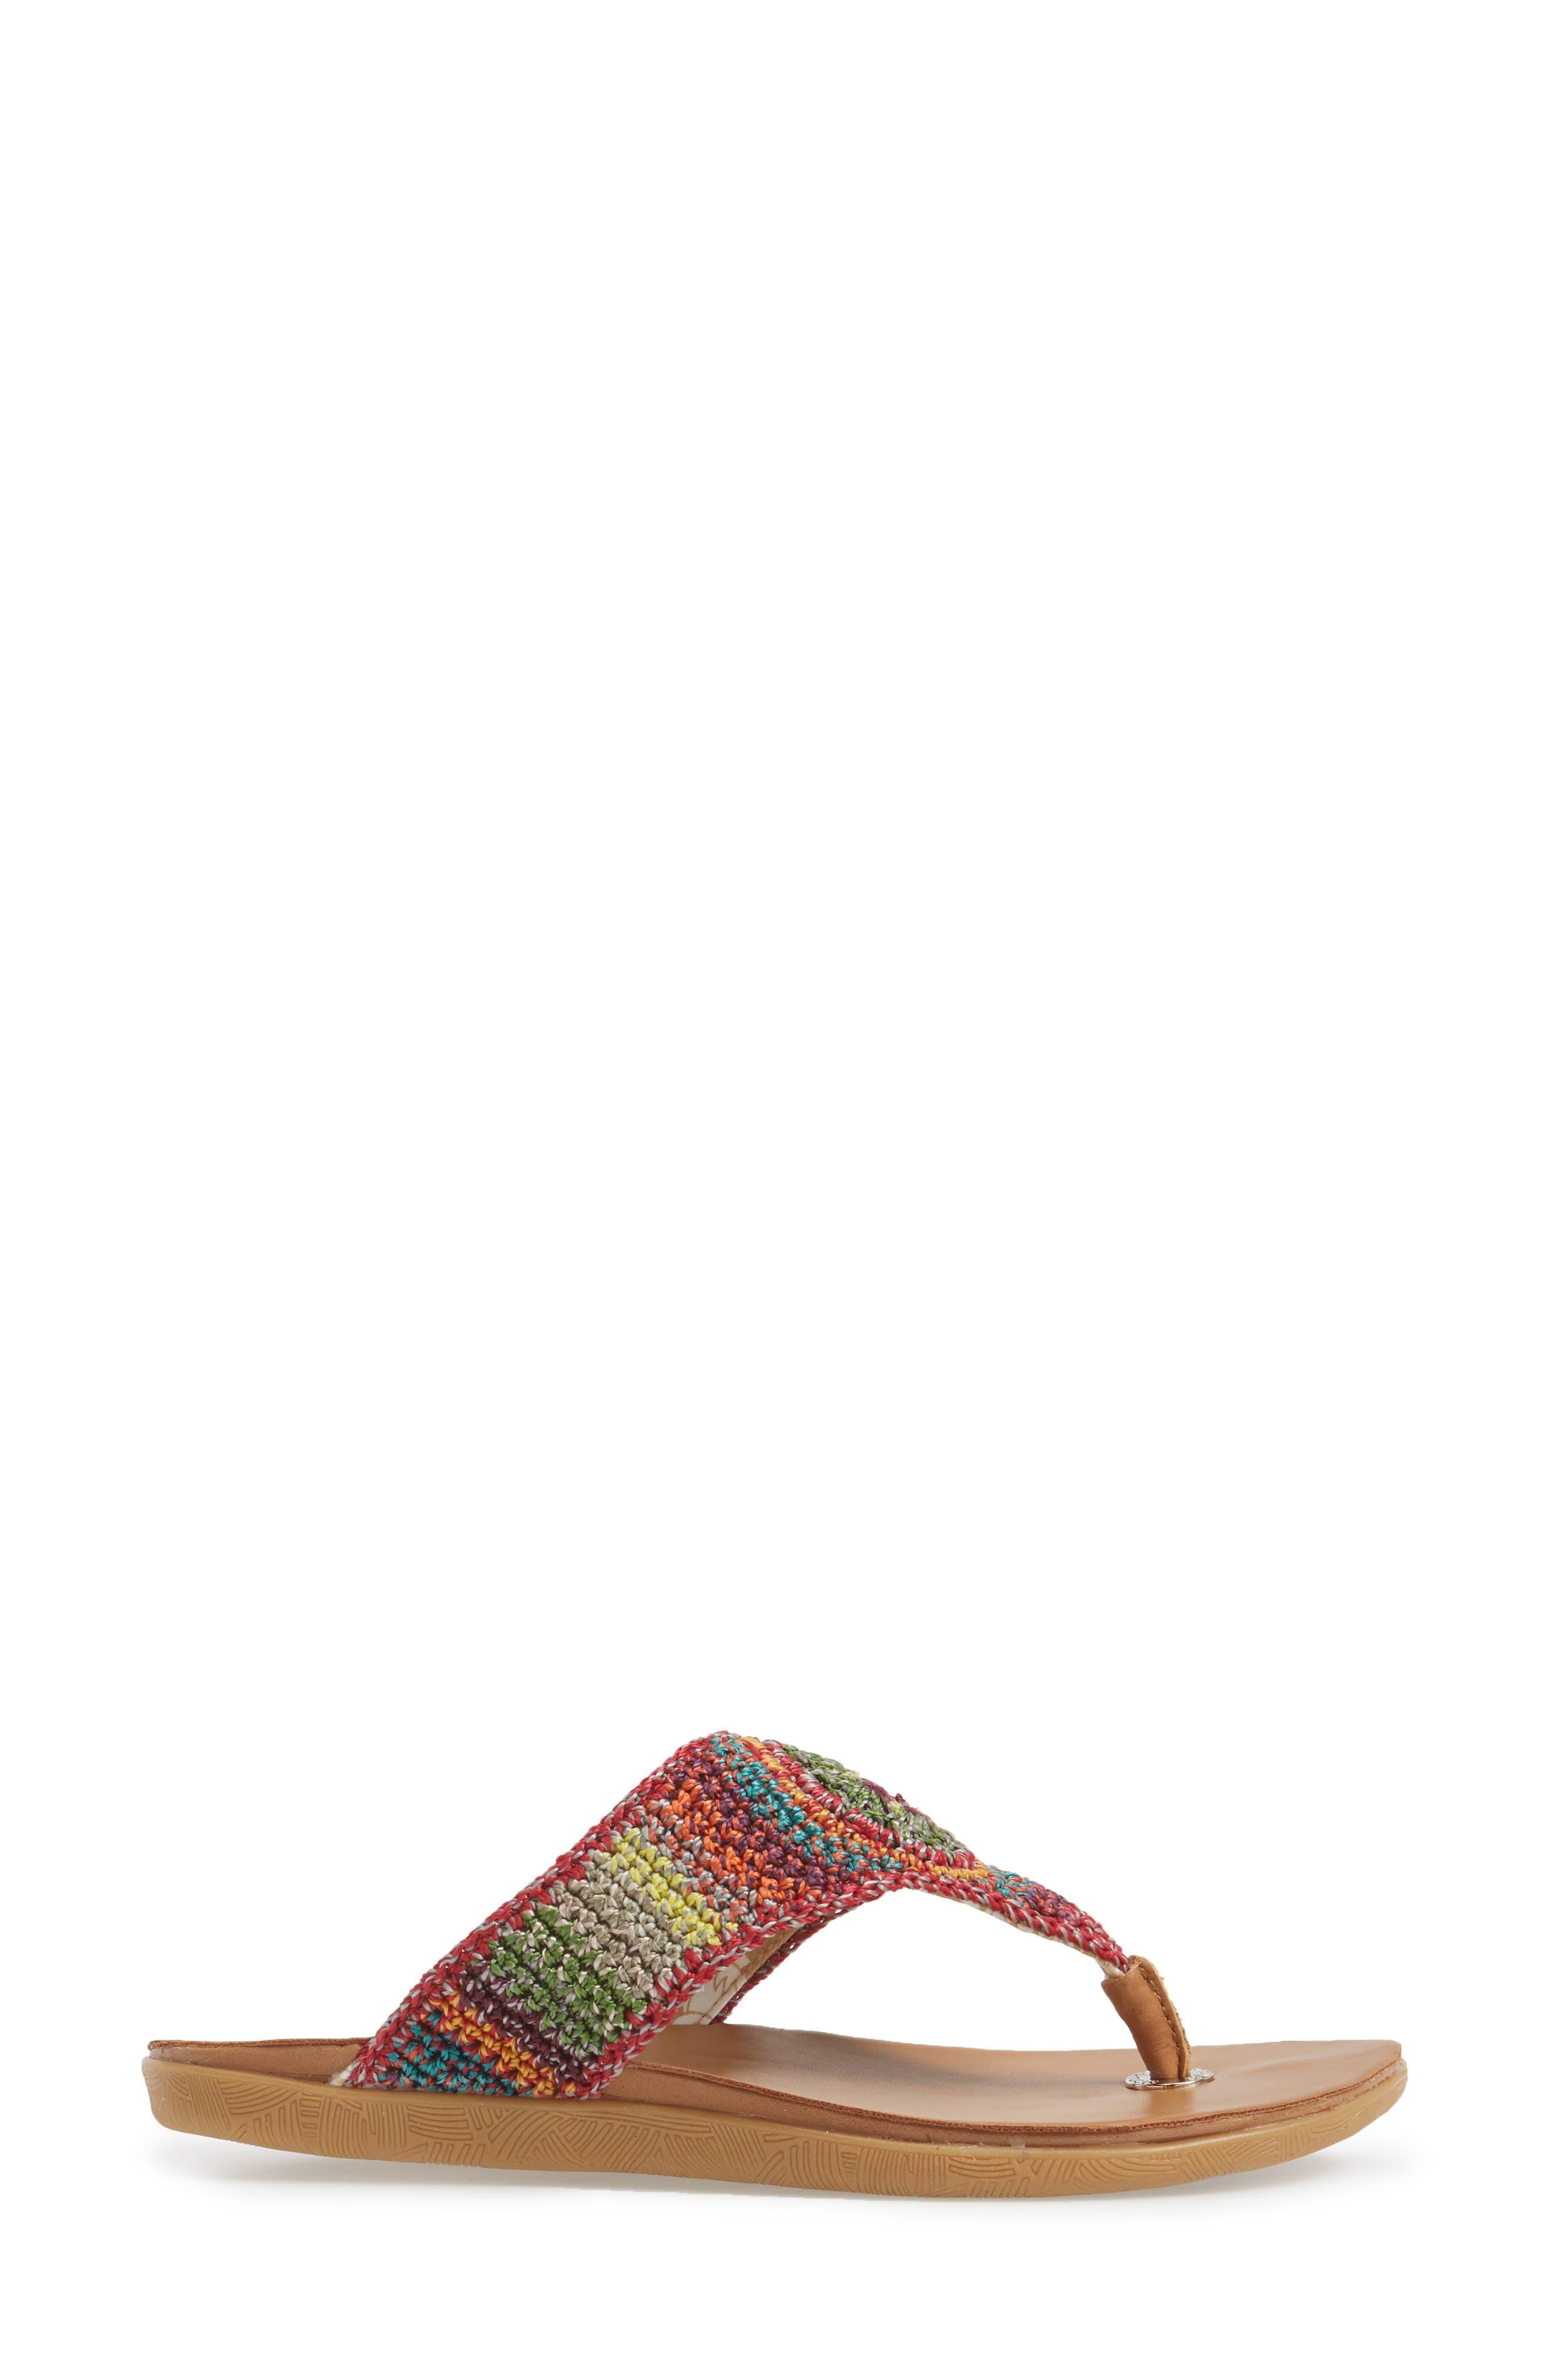 Alternate Image 3  - Sakroots Sarria Flip Flop (Women)